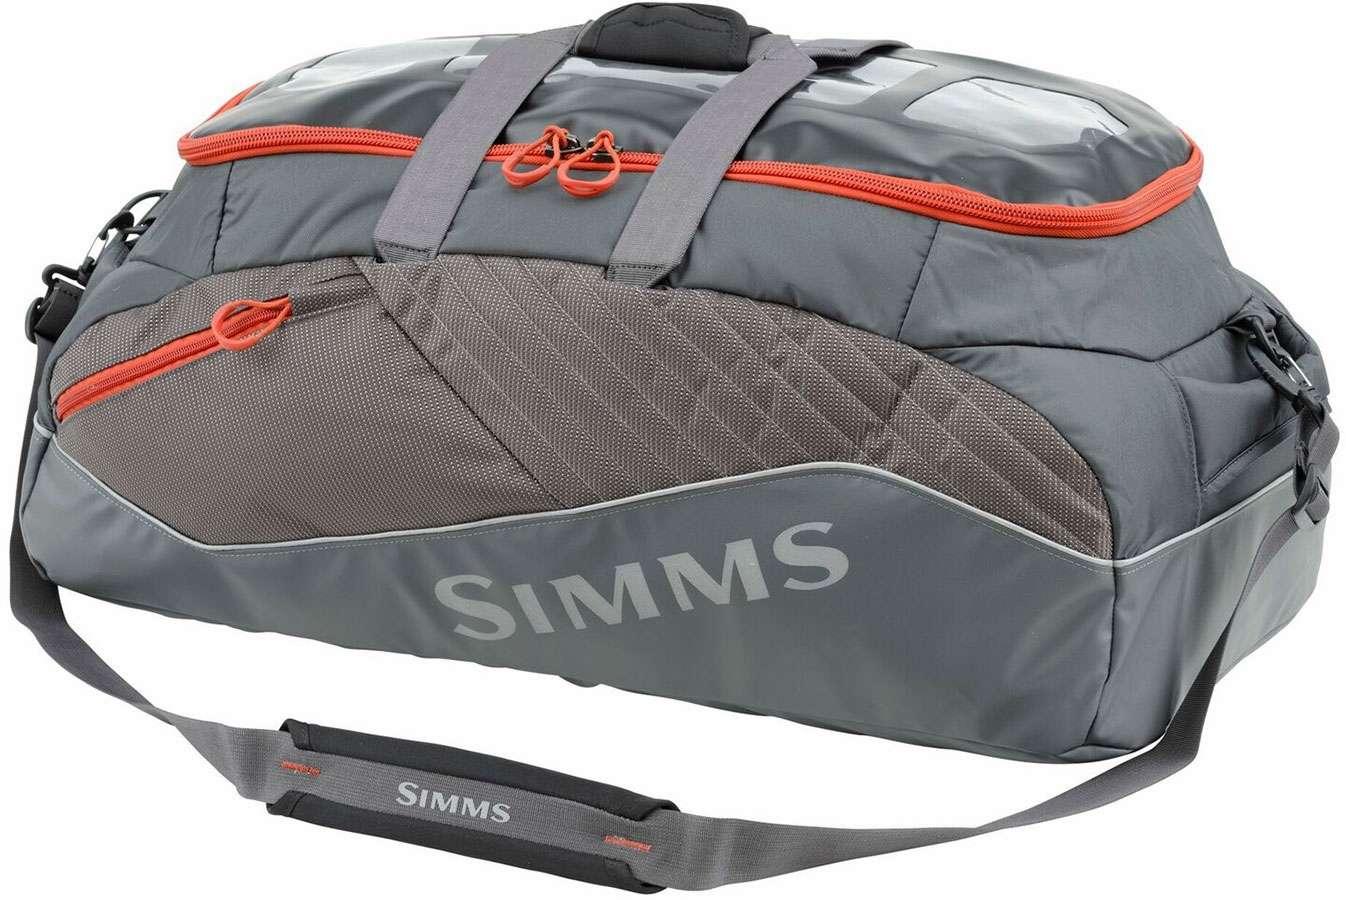 Simms 11461 025 00 Challenger Tackle Bag Large